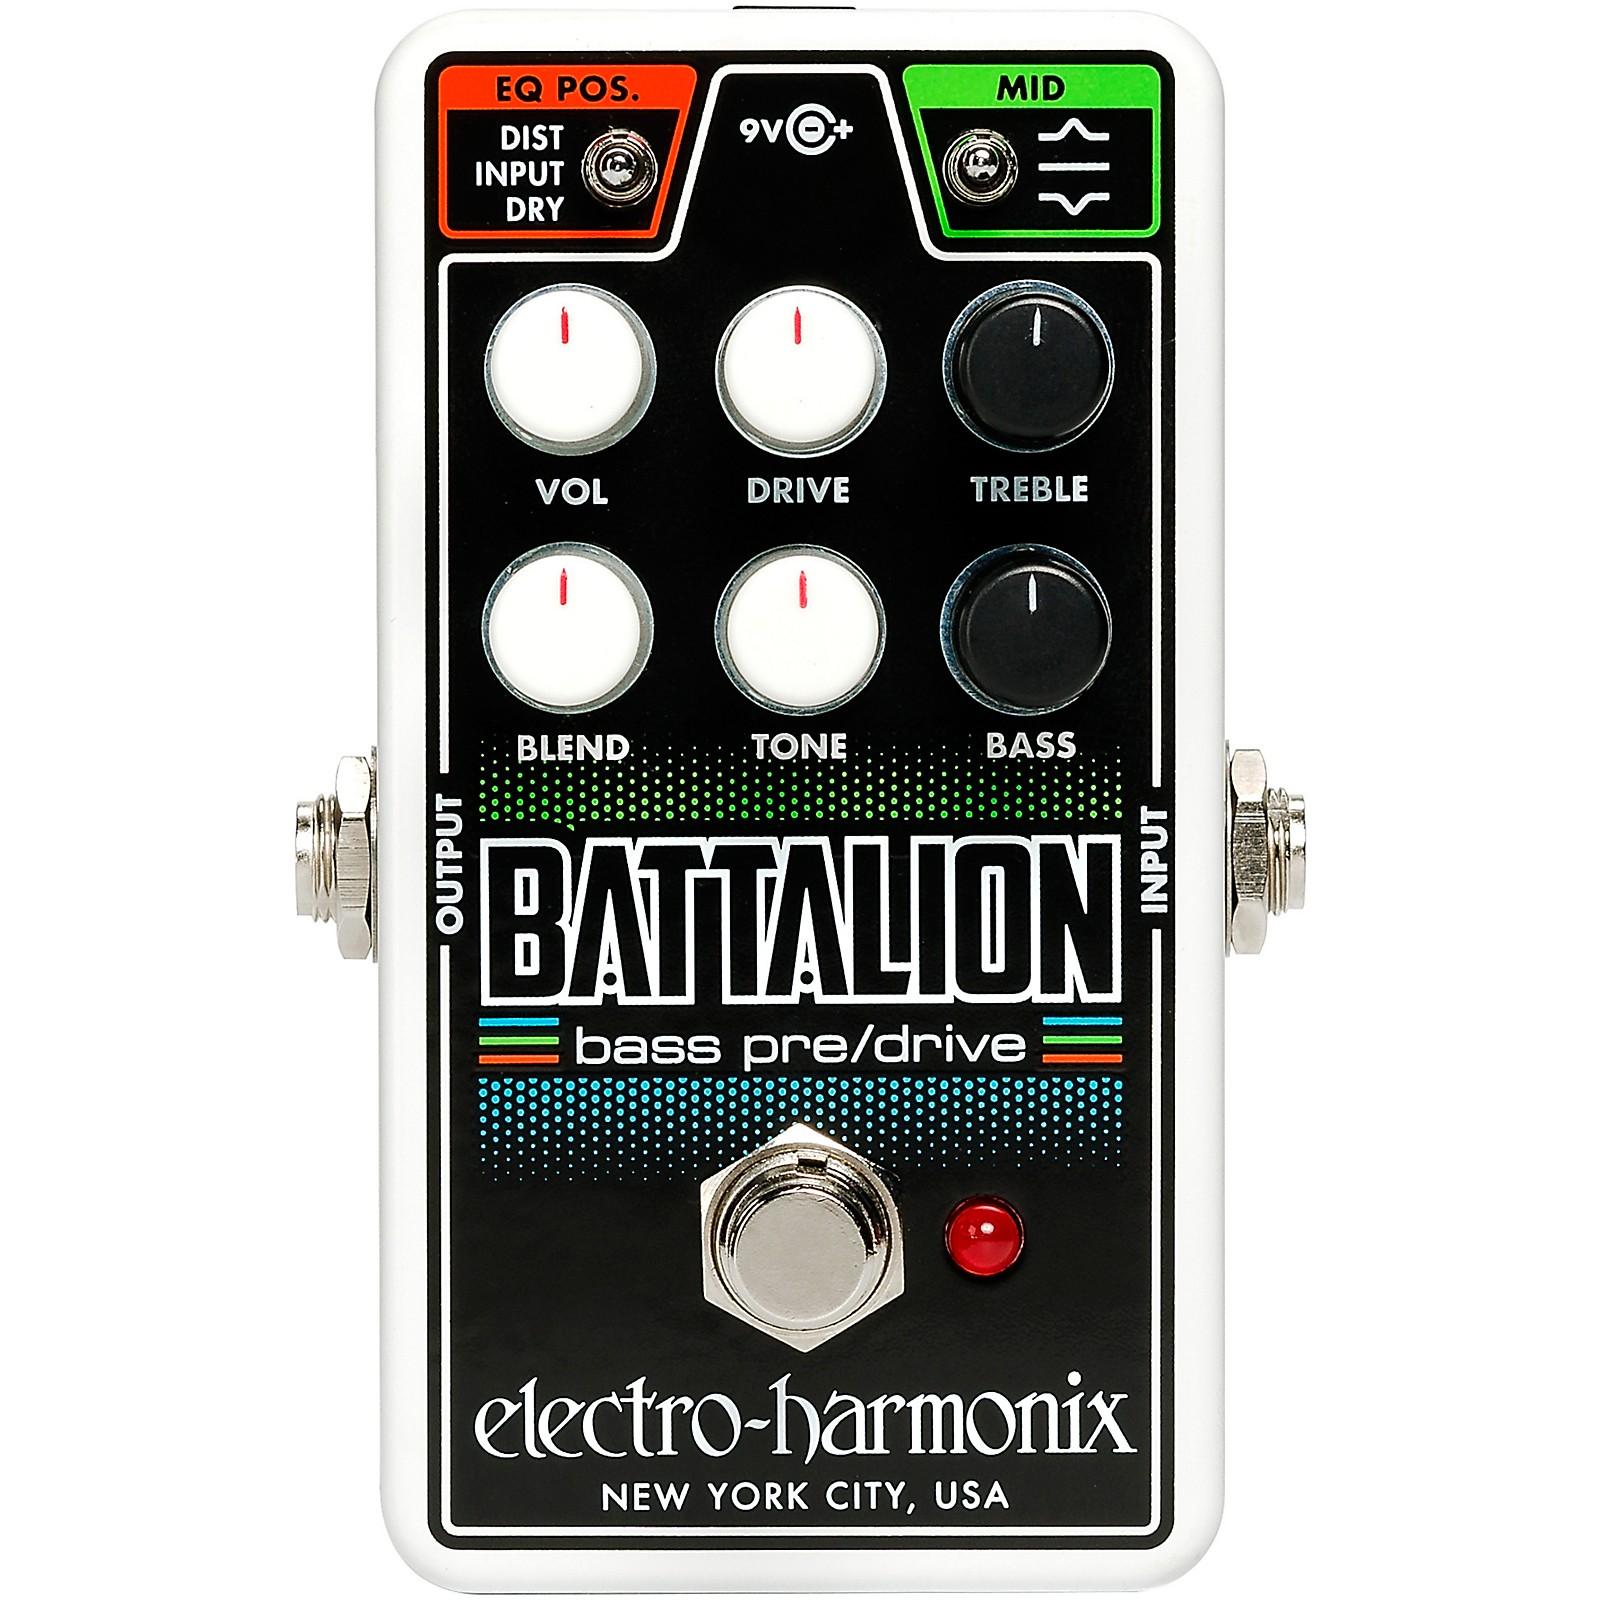 Electro-Harmonix Nano Battalion Bass Preamp & Overdrive Effects Pedal